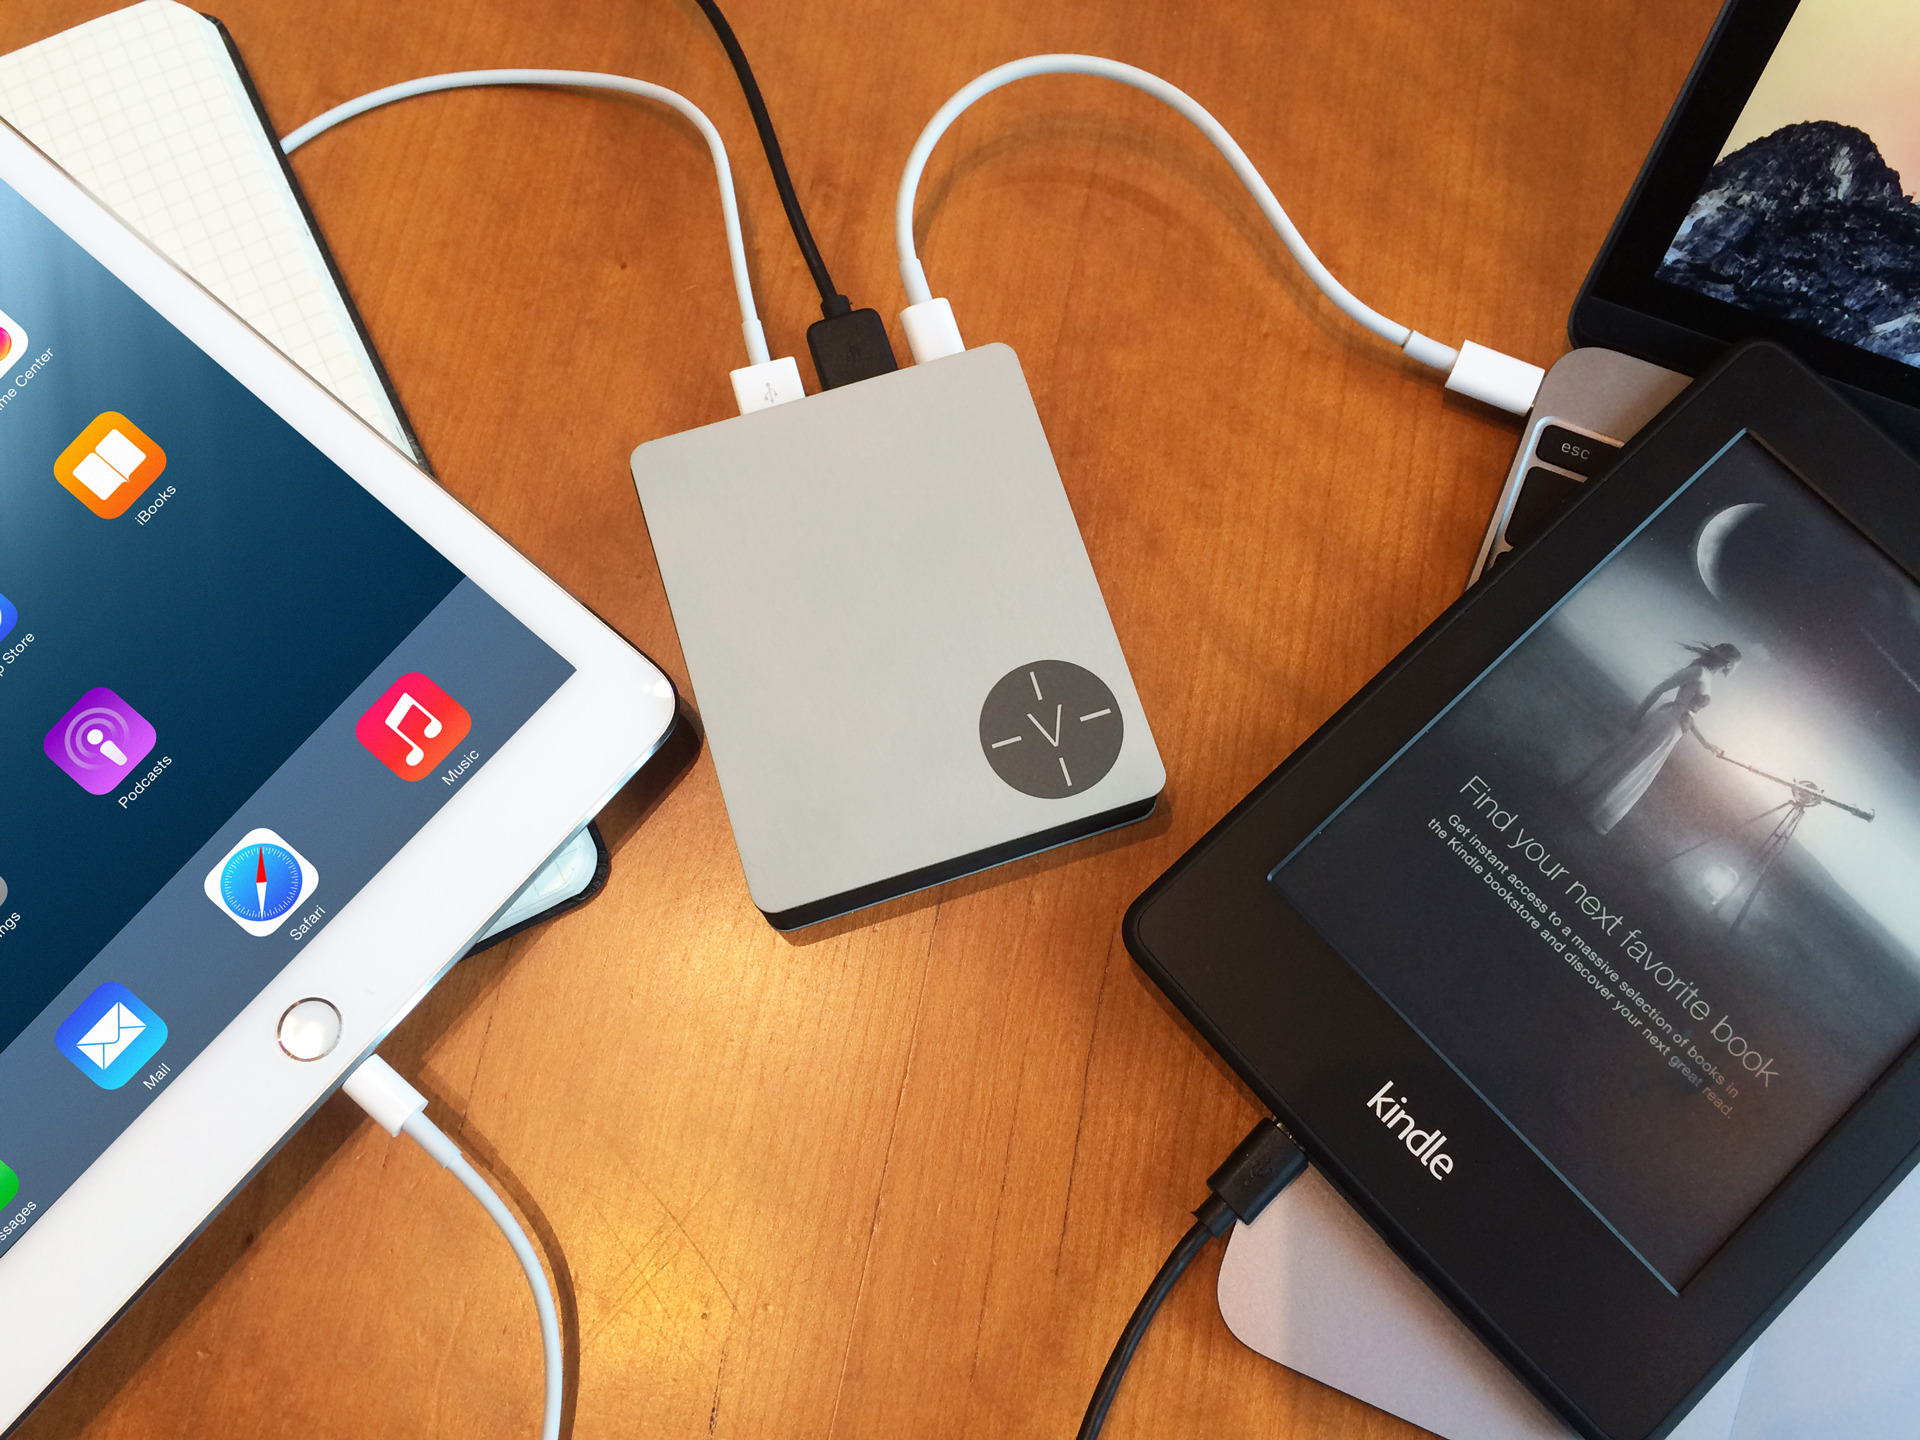 Charging-macbook-ipad-kindle